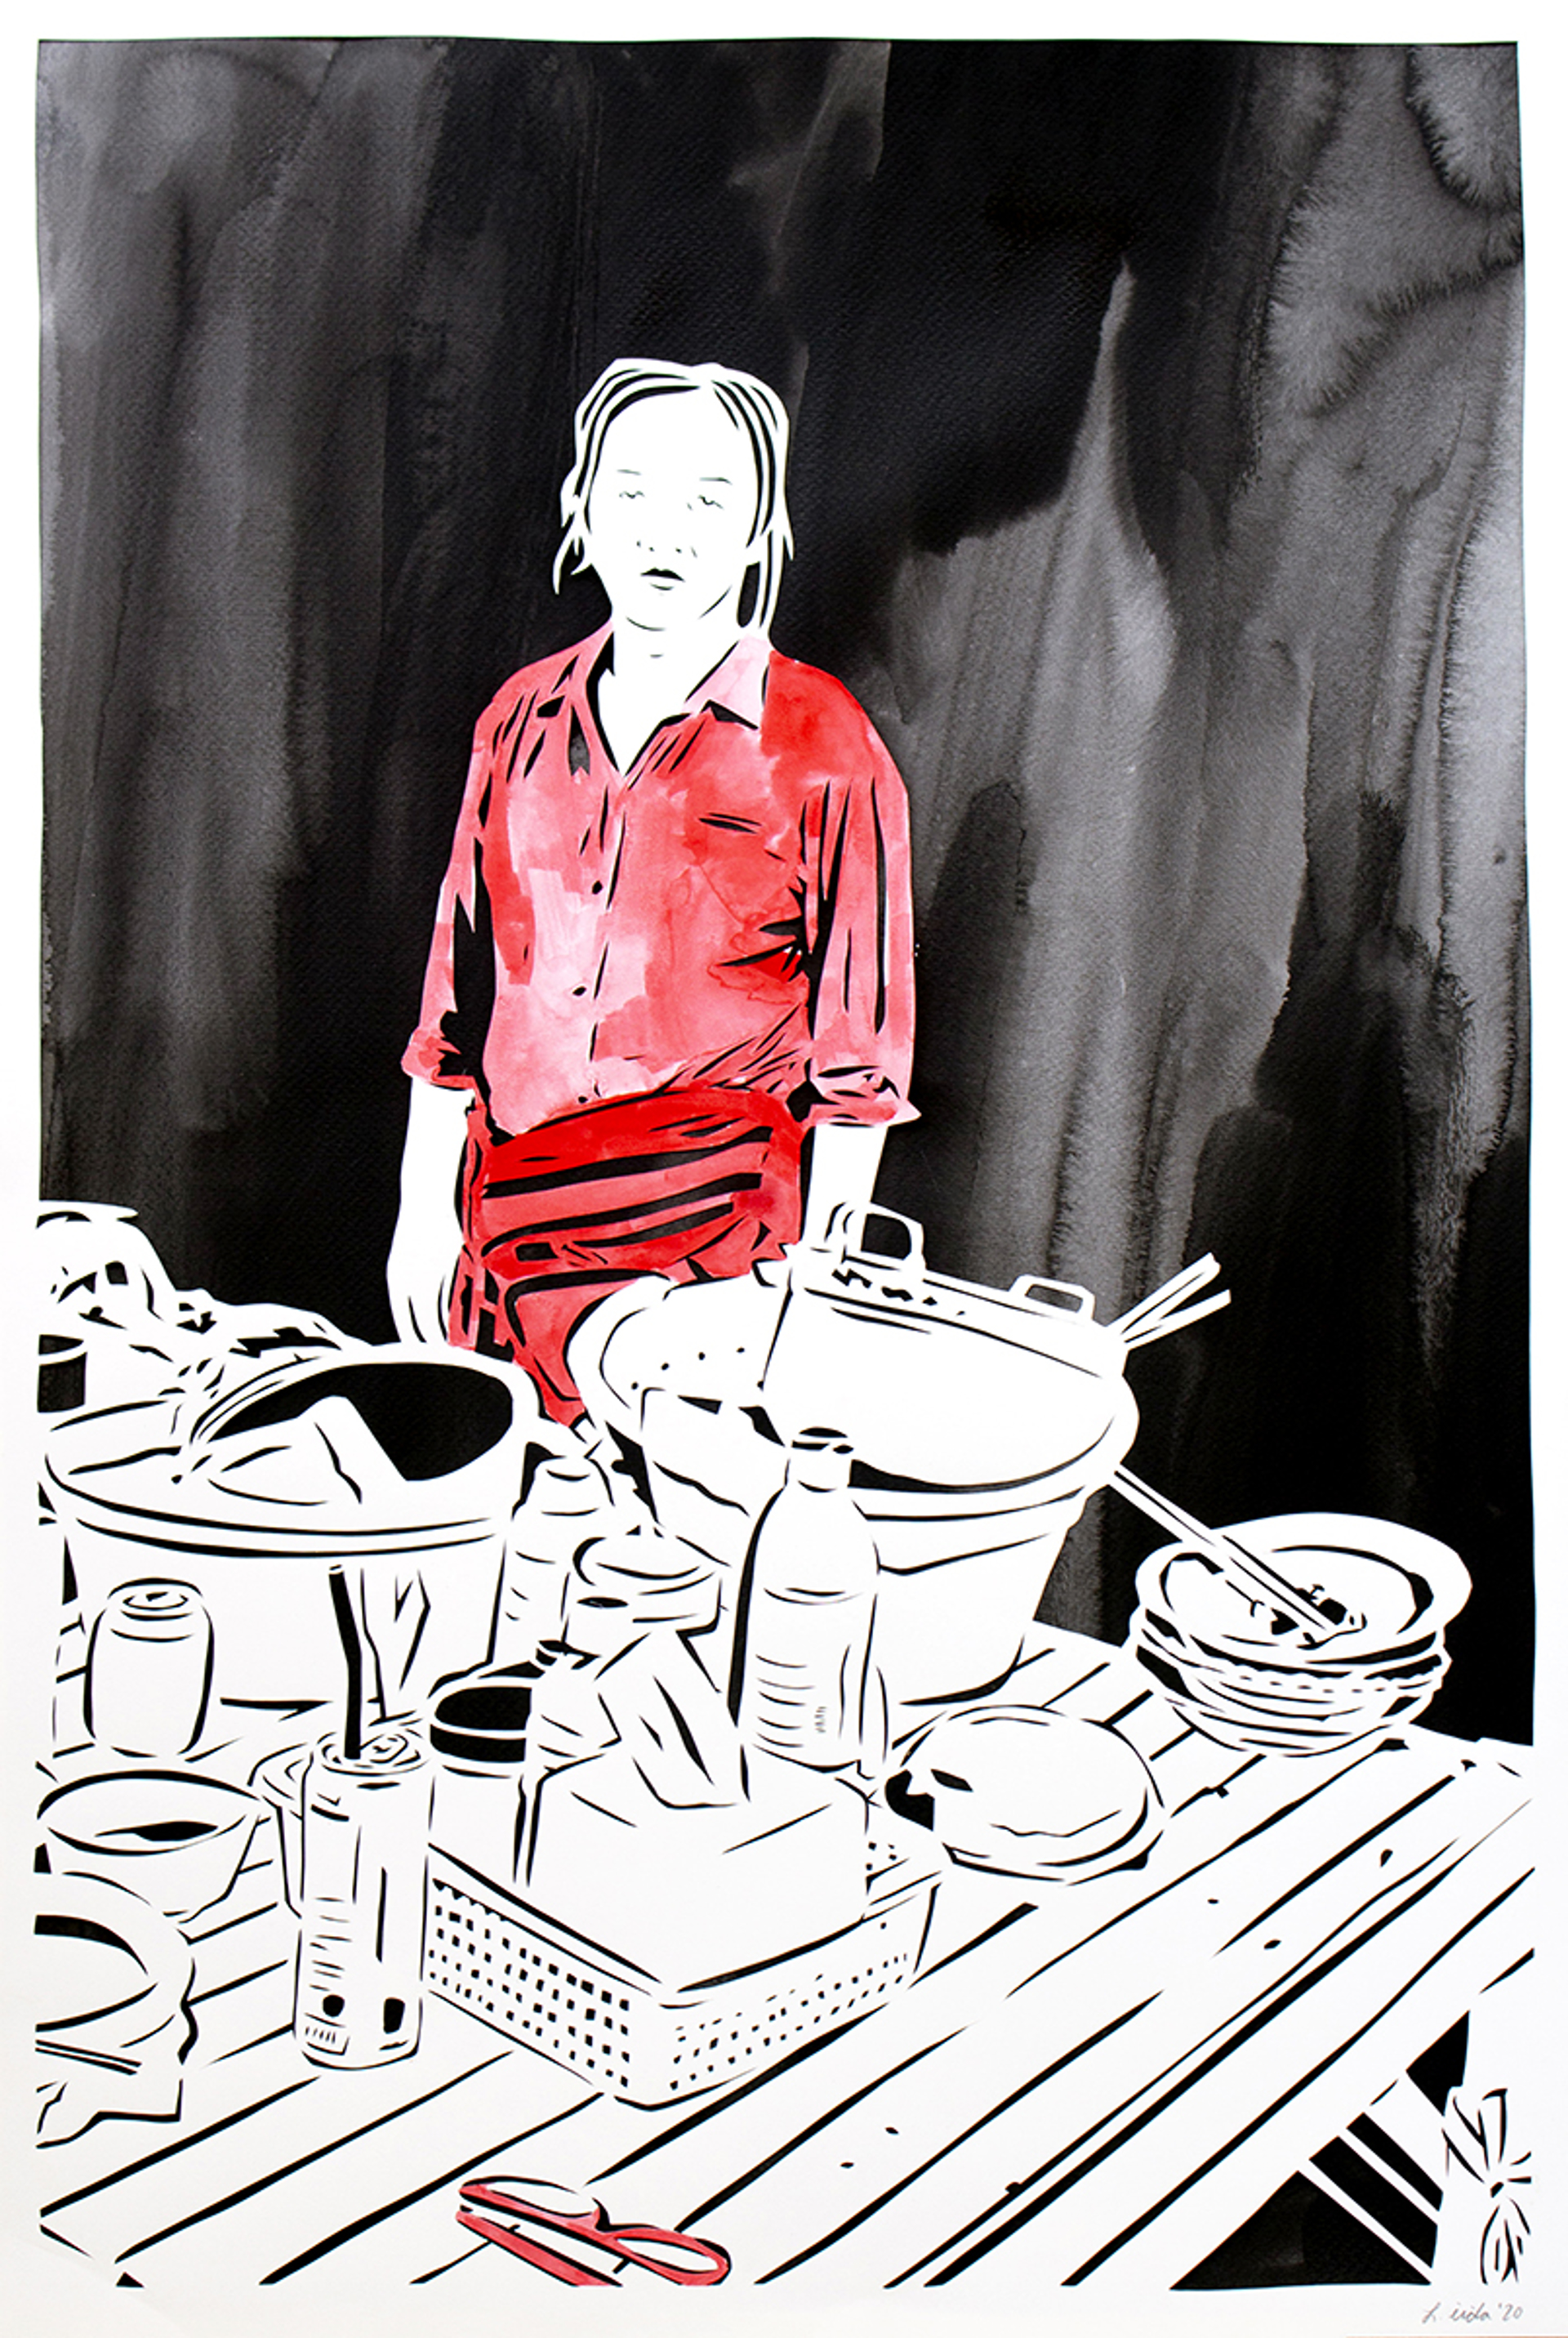 12. Heavy: The Appearance of a Phnom Penh Noodle Seller, Street 258 by Lauren Iida